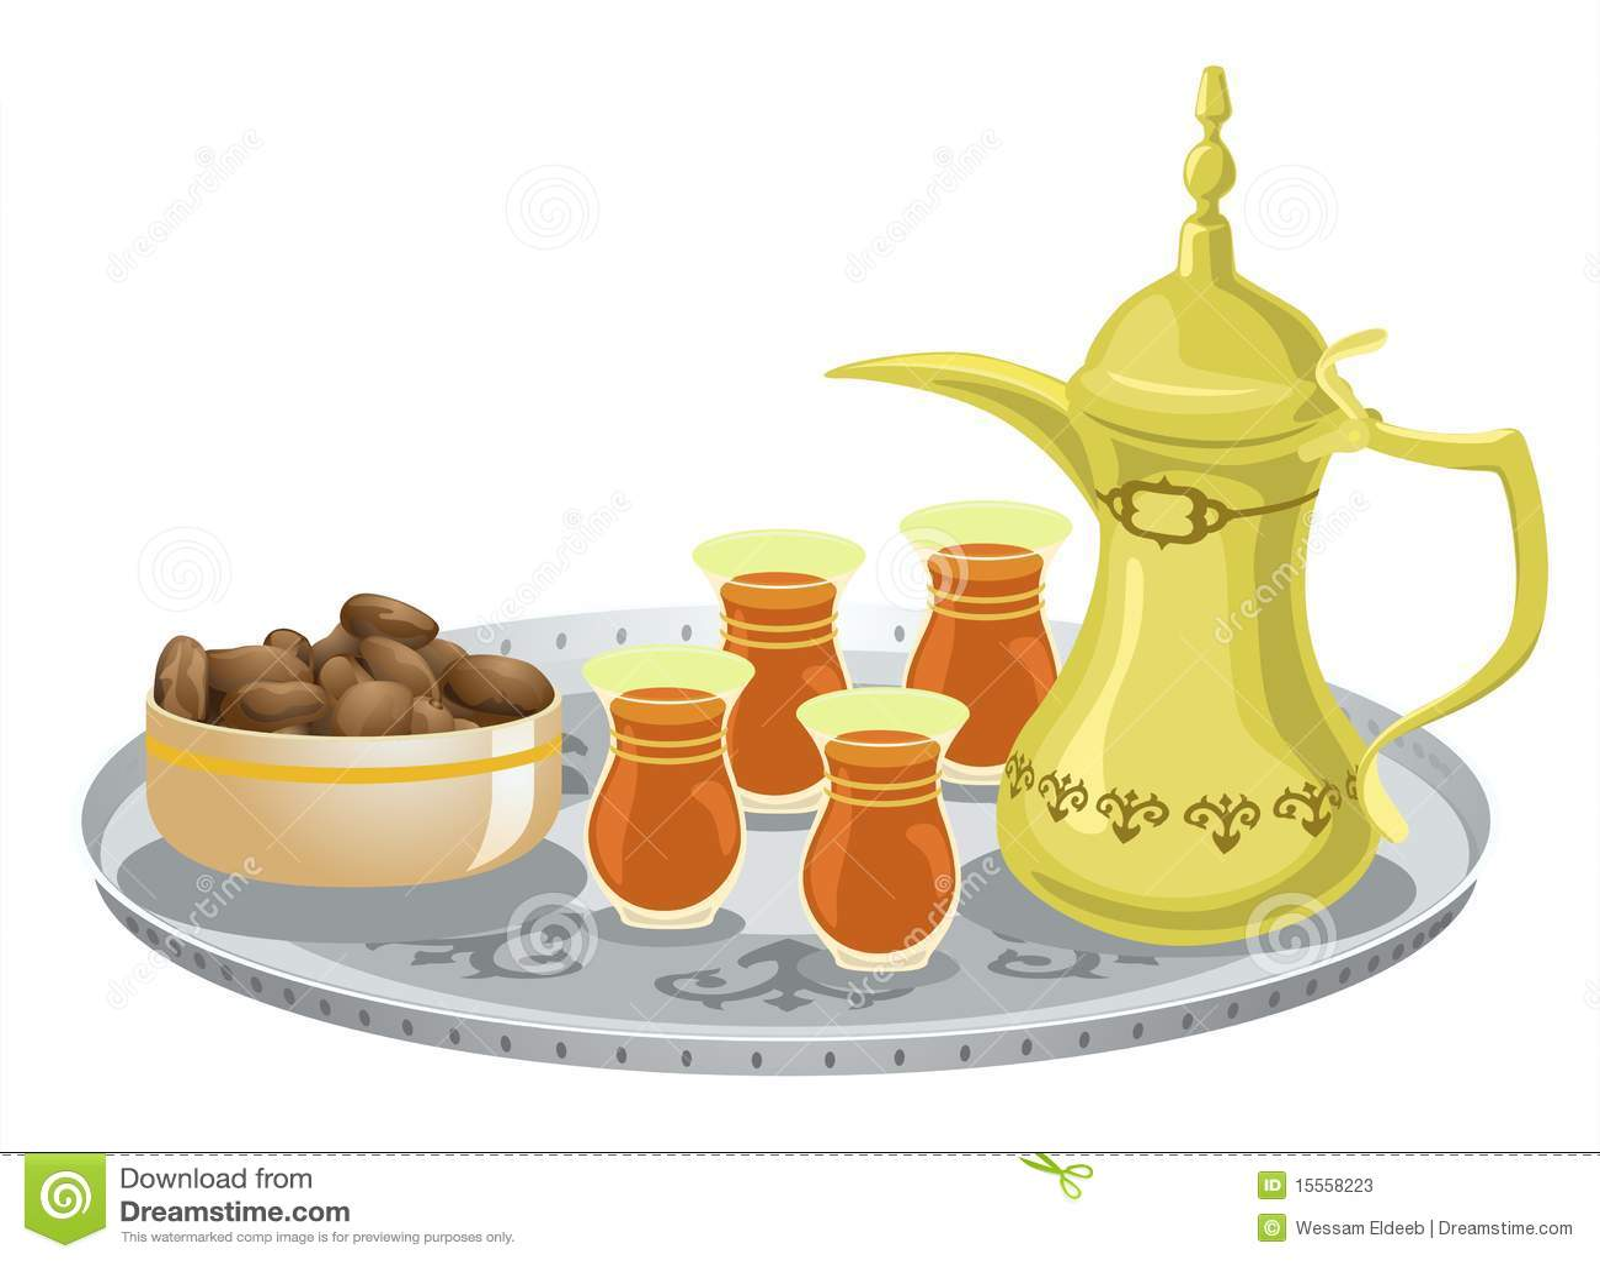 Arabian Tea Set With Dates 1